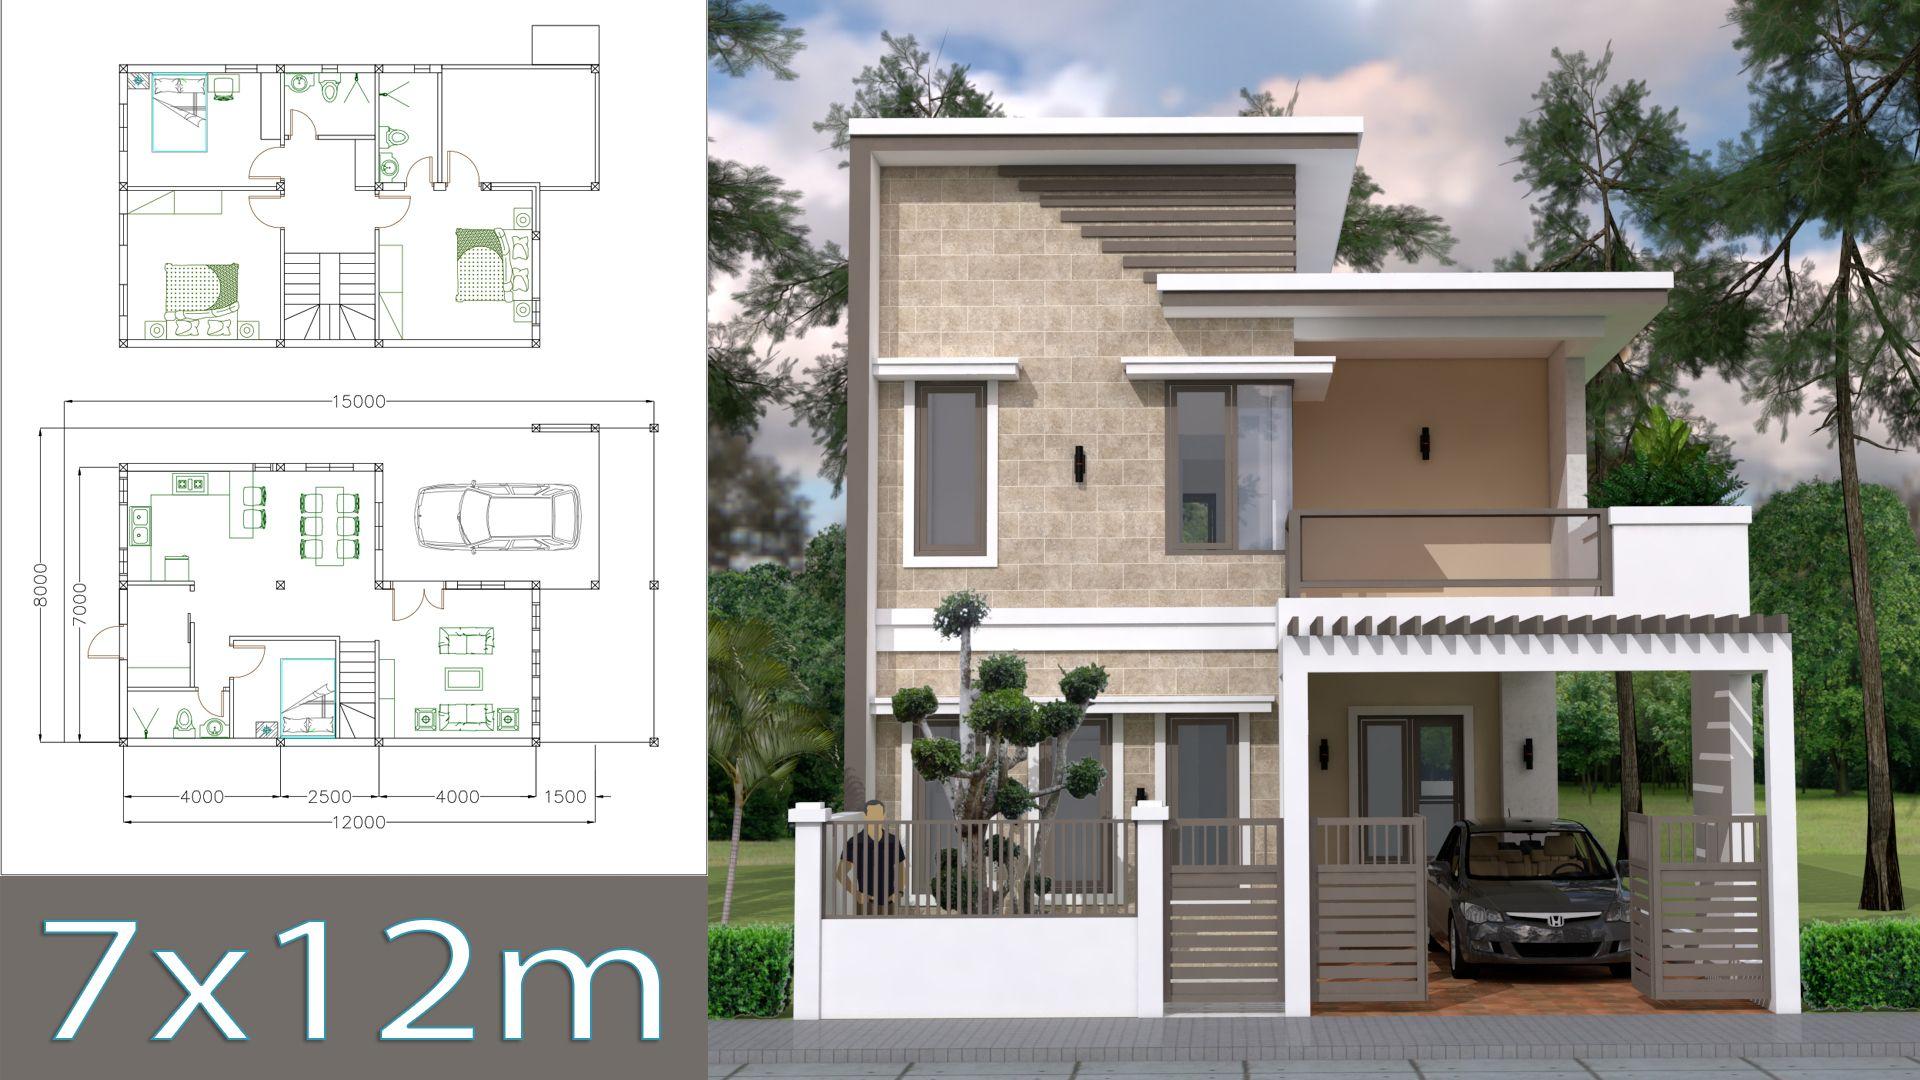 Home Design Plan 7x12m With 4 Bedrooms Plot 8x15 Planos